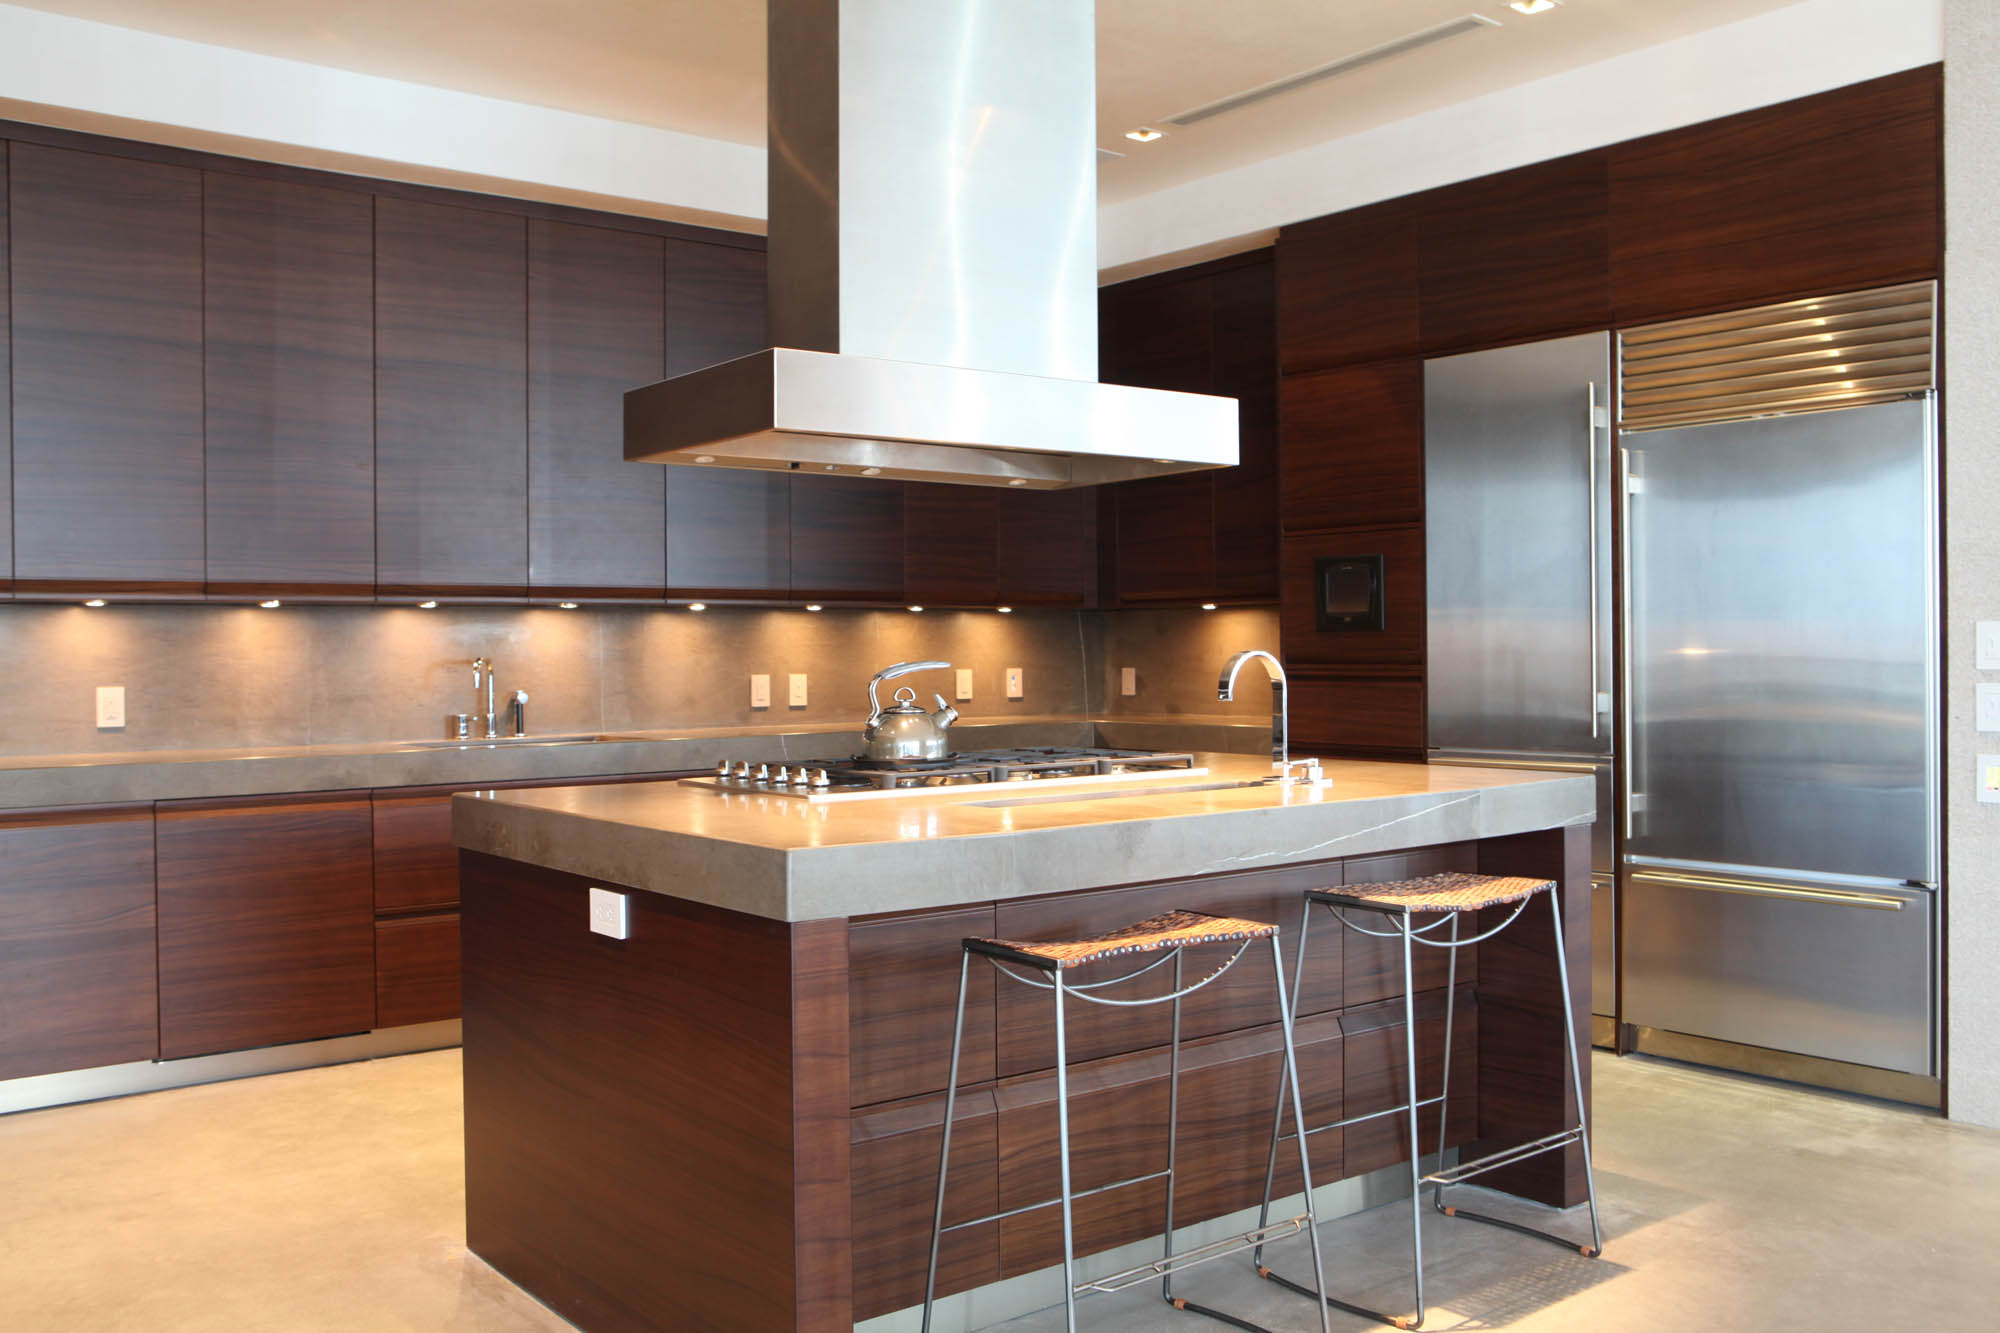 Muebles de cocina ecol gicos comprometidos con el medio for Guardas para cocina modernas